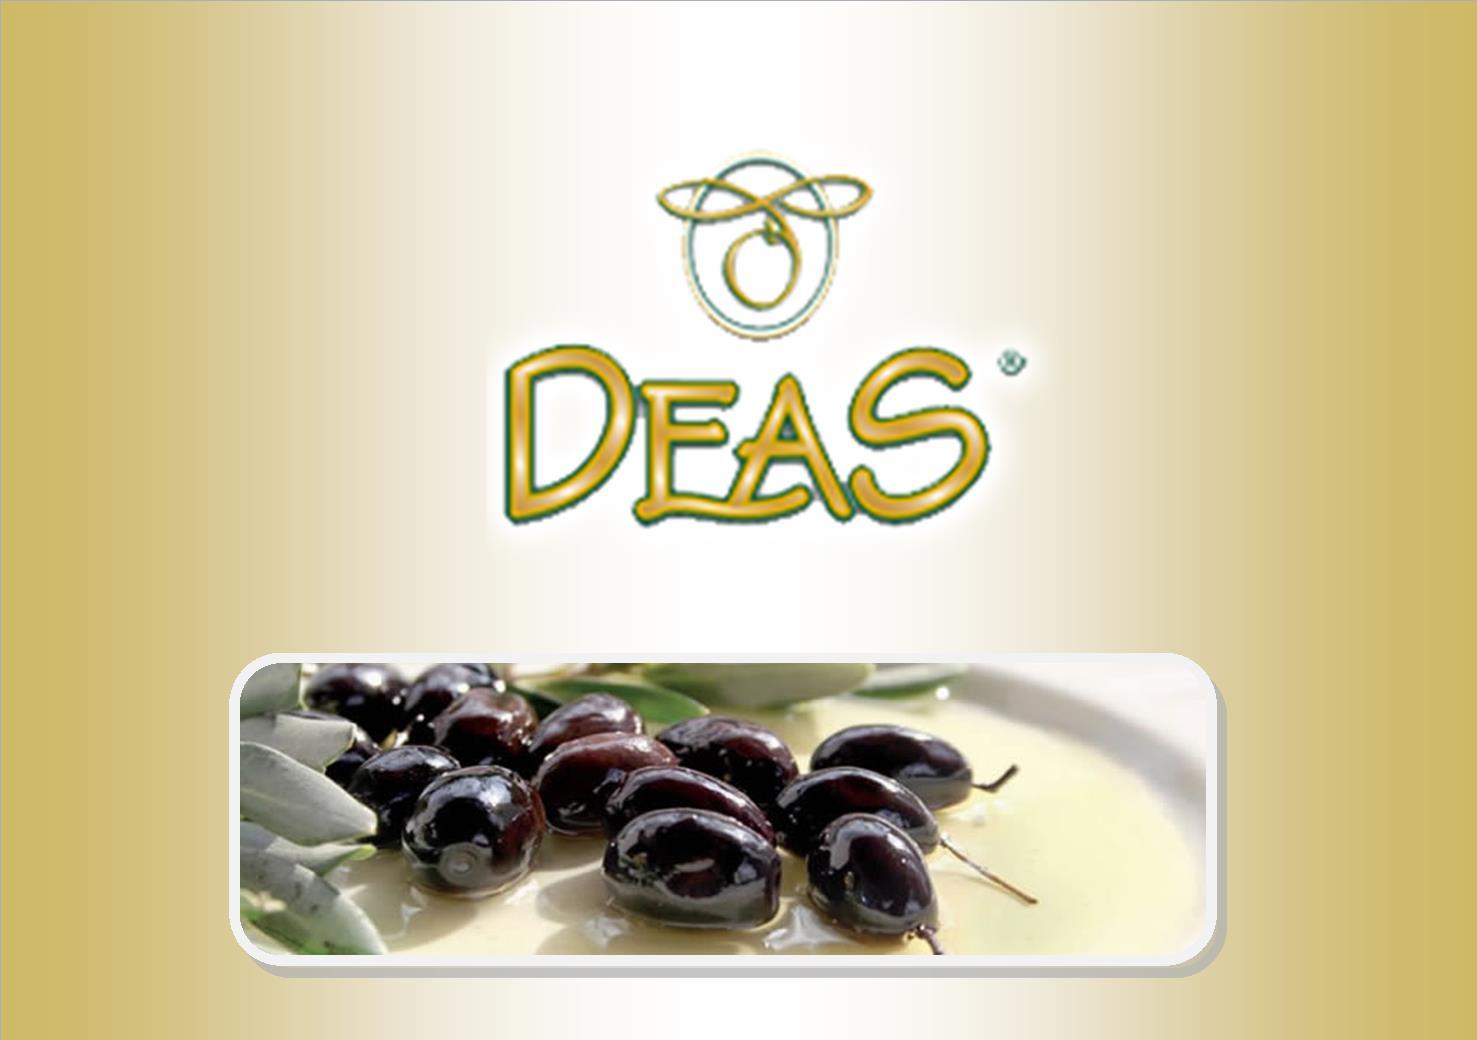 Deas Olives